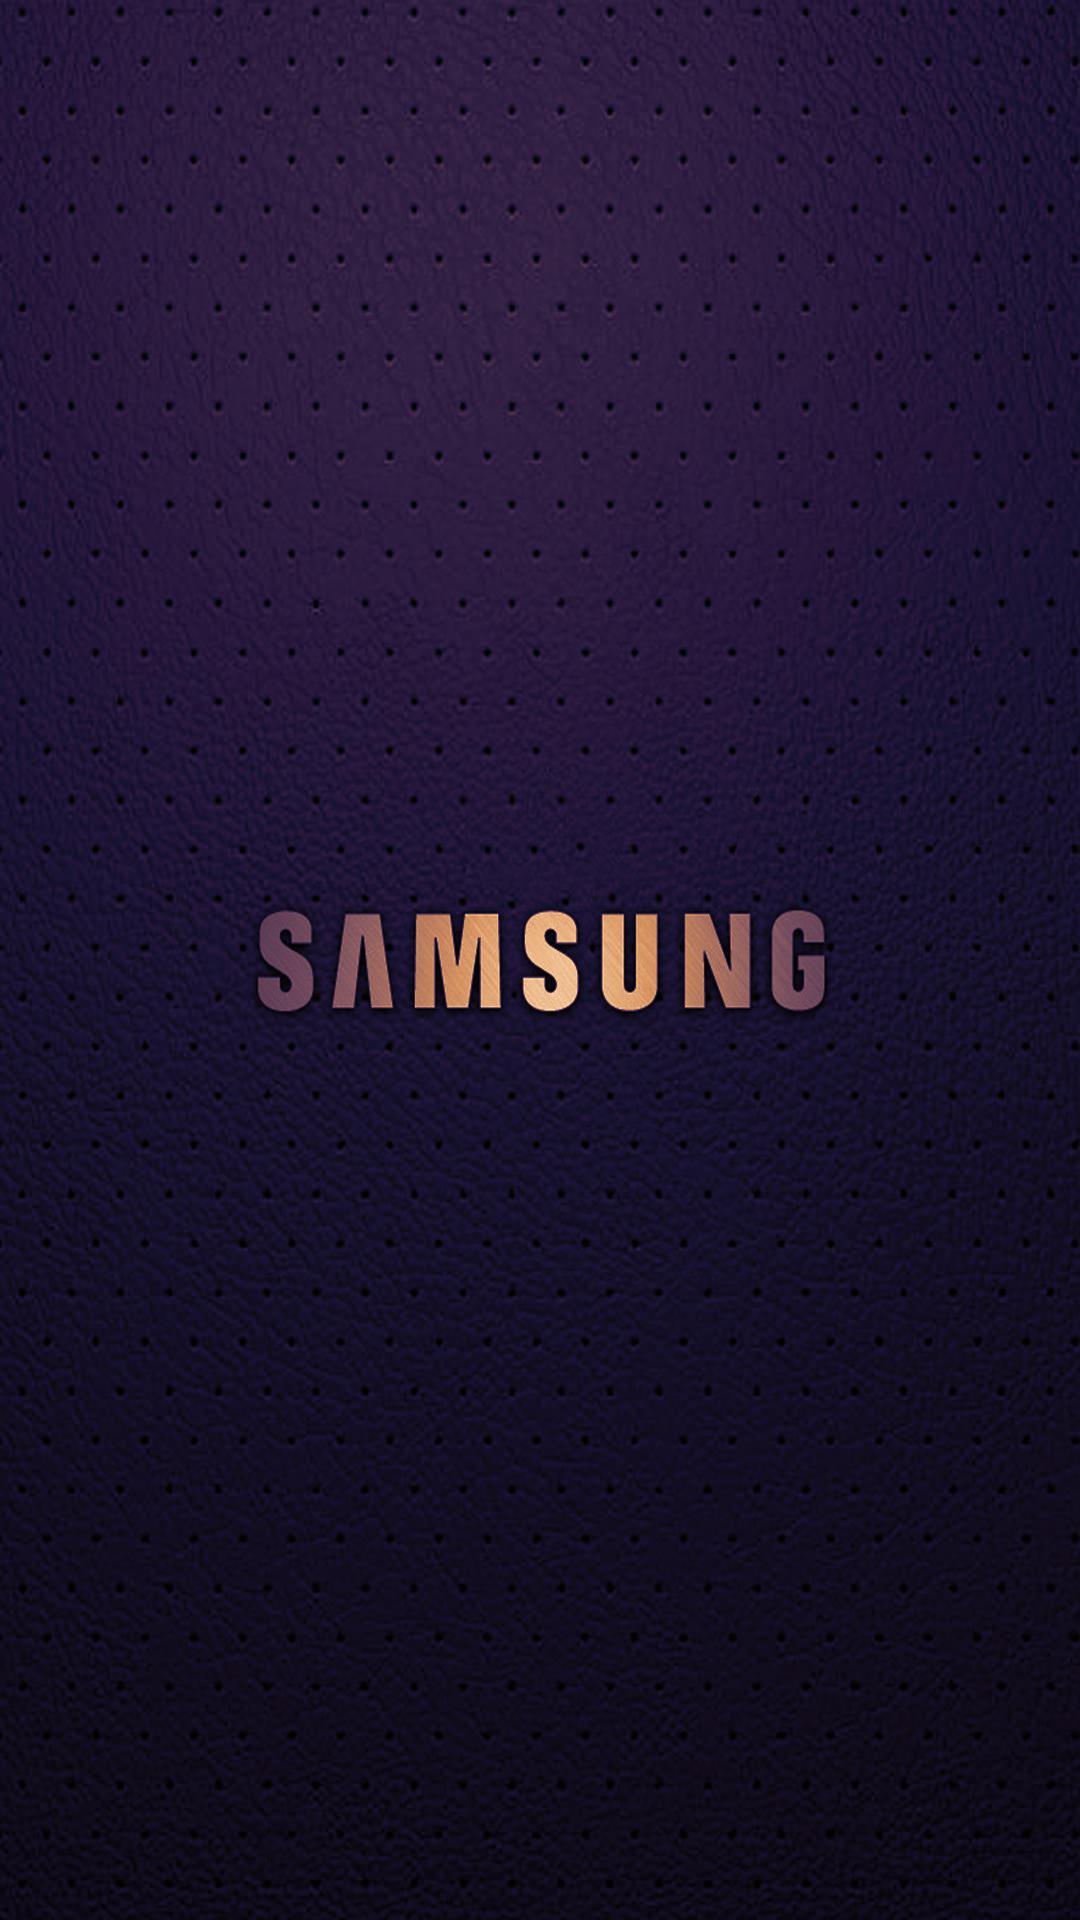 Samsung Logo Wallpaper Sc Smartphone